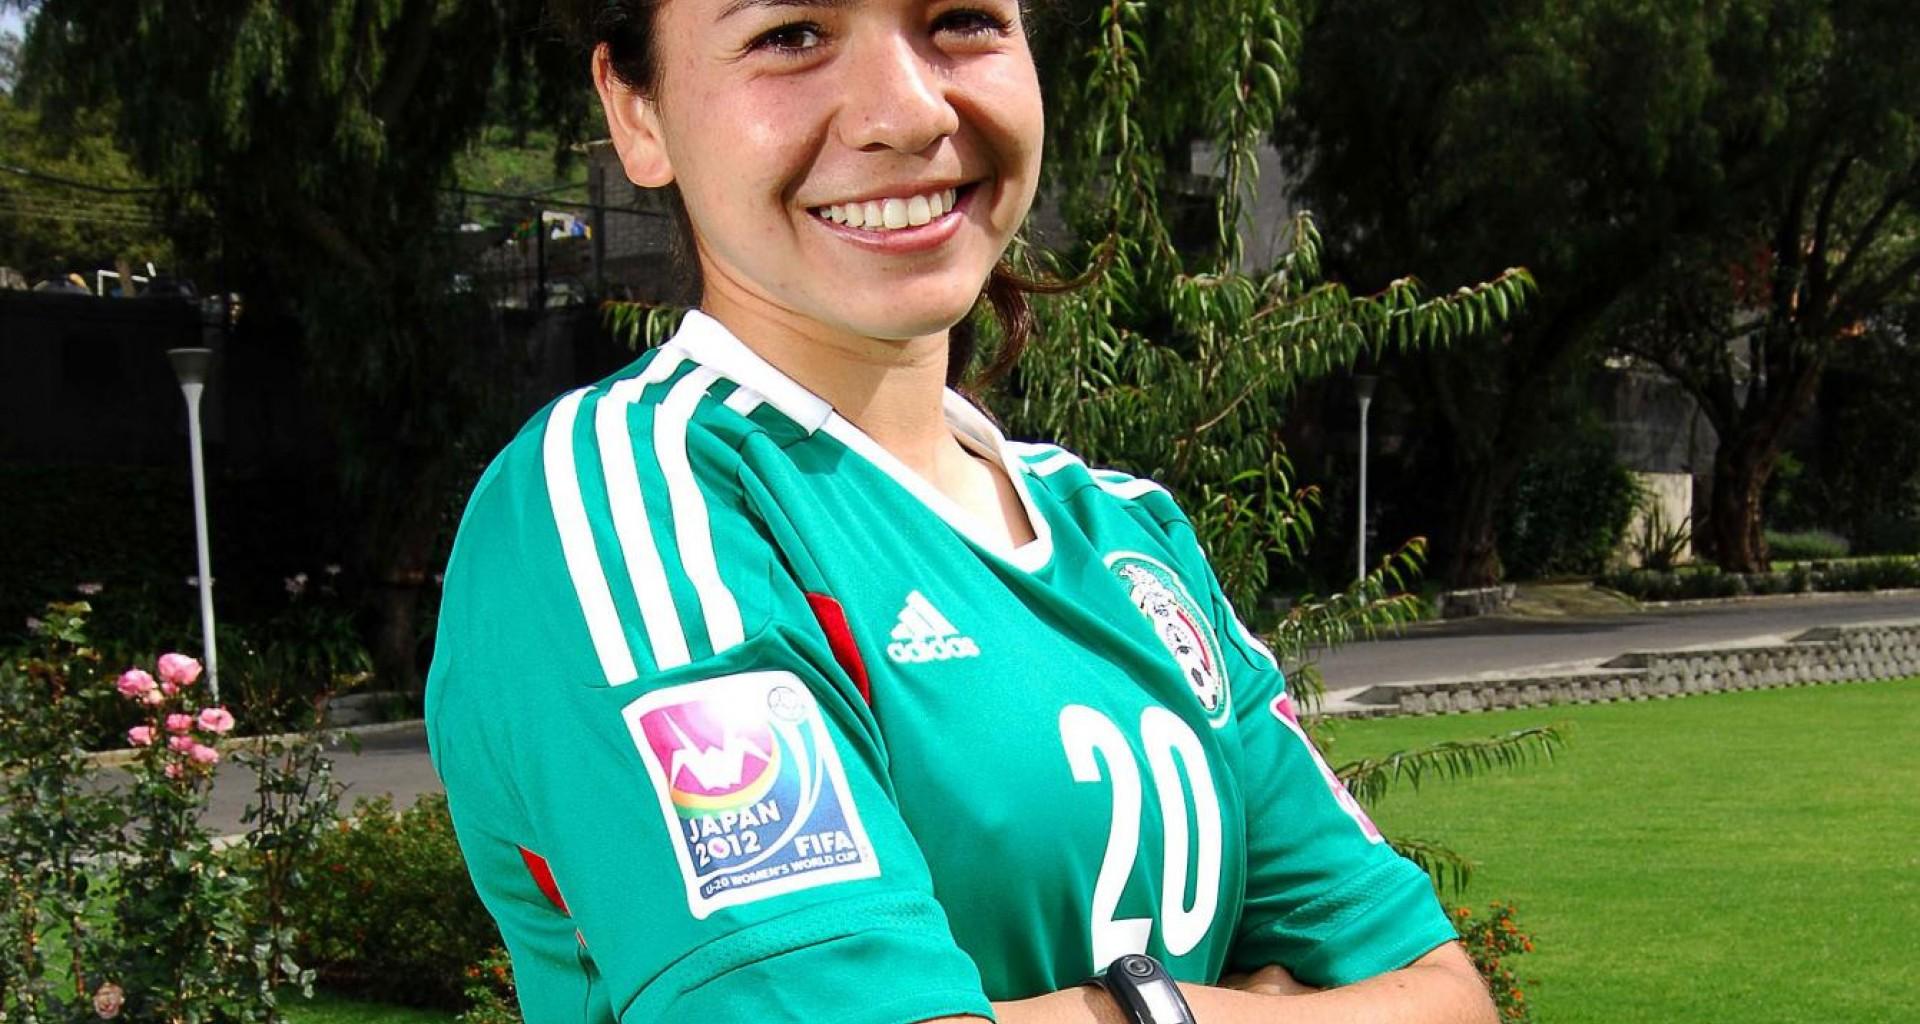 Estudiante mexicana de toluca - 3 4